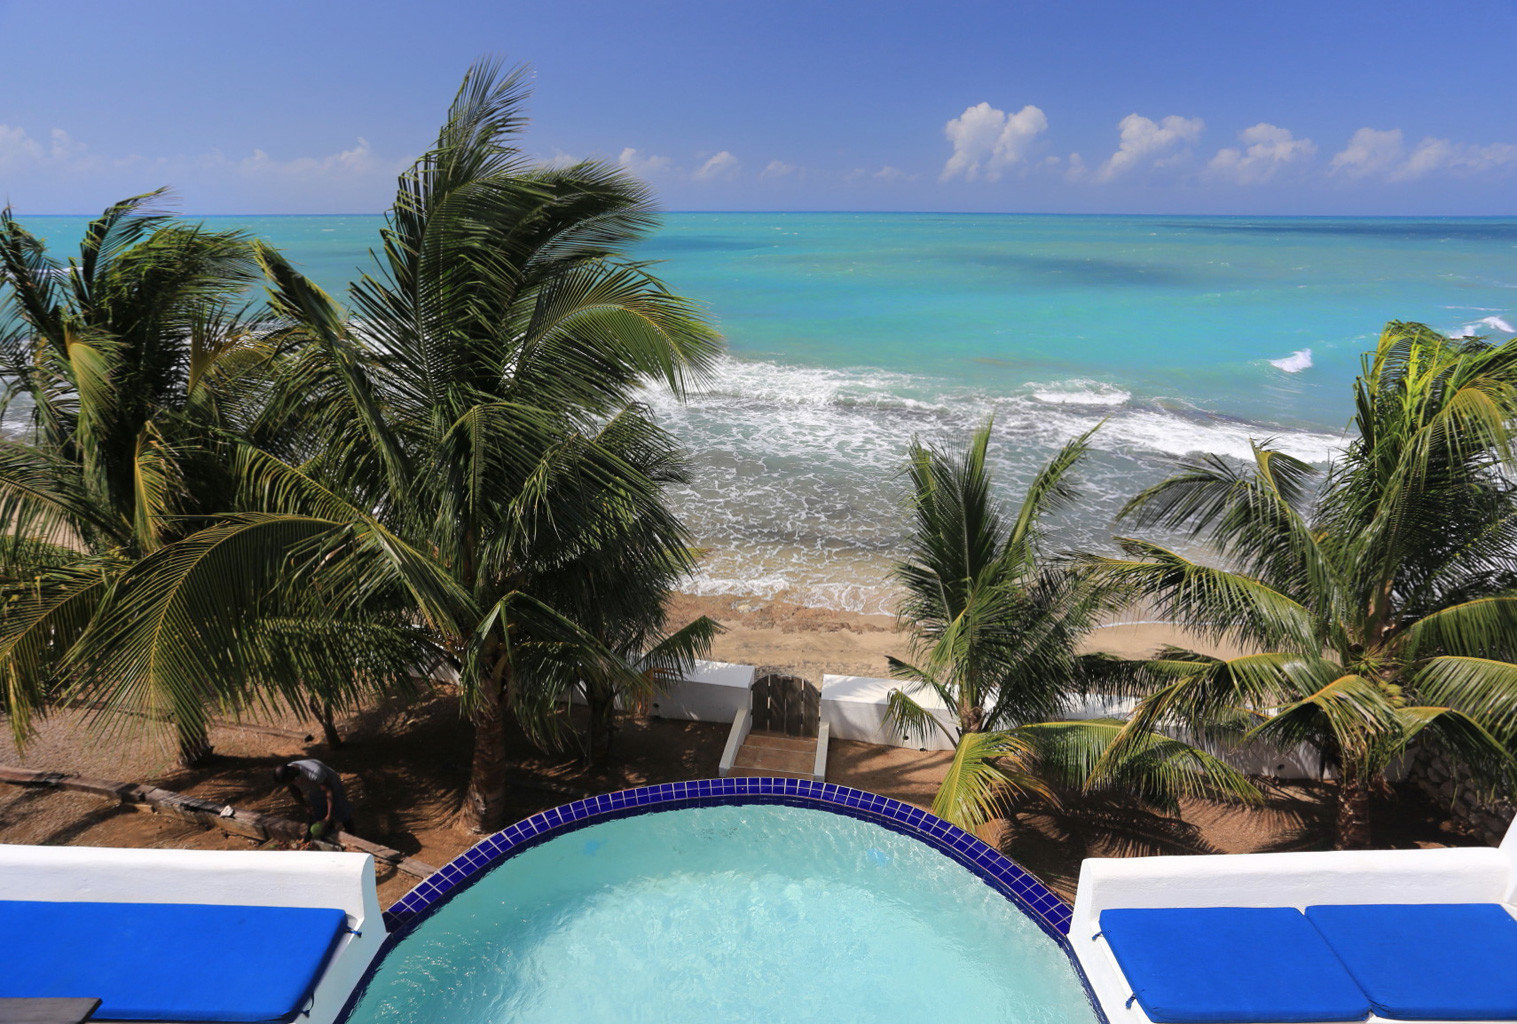 Beachfront Boutique Pool Romantic Rustic Tropical tree sky swimming pool leisure Beach caribbean property Resort Ocean Sea tropics arecales Lagoon blue Coast cape lawn Villa Island outdoor object